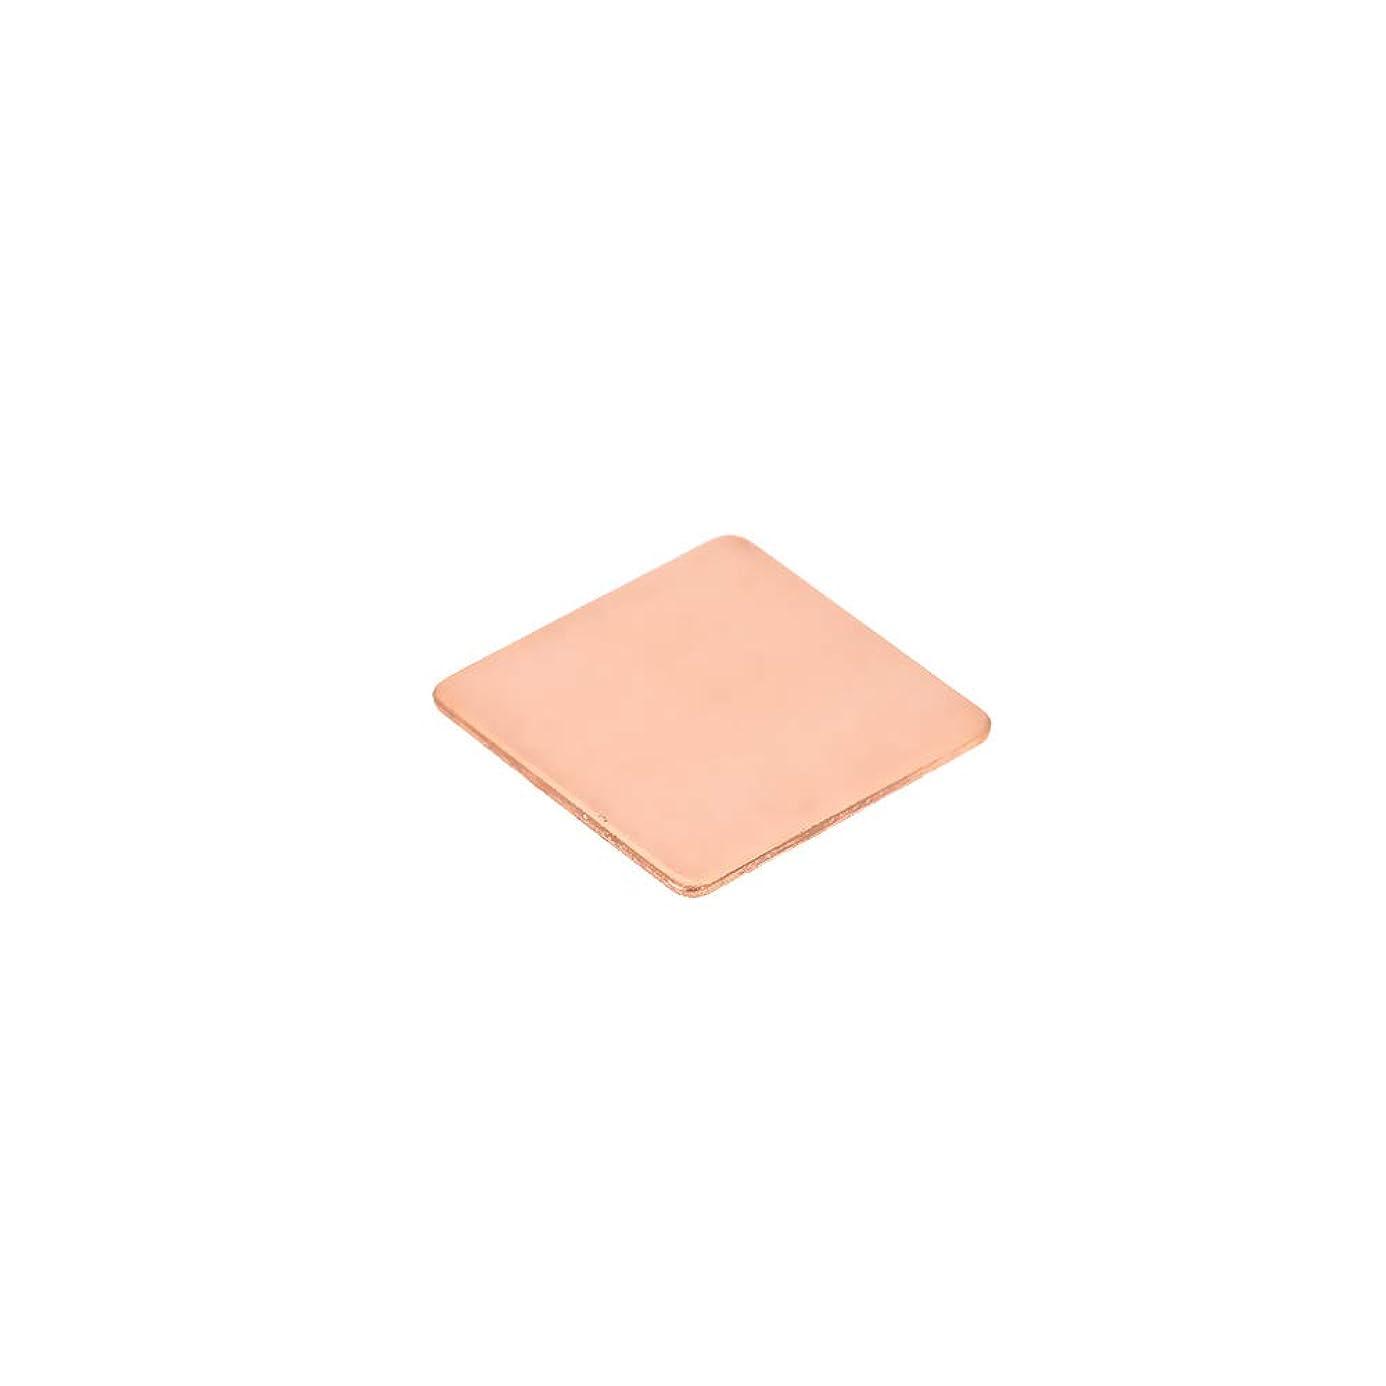 Festnight Desktop Aluminium Heatsink Sheet CPU GPU RAM Copper Cooling Sheet High-Performance Conducting Strip Heat Dissipation 15150.6mm 20pcs mae9353878